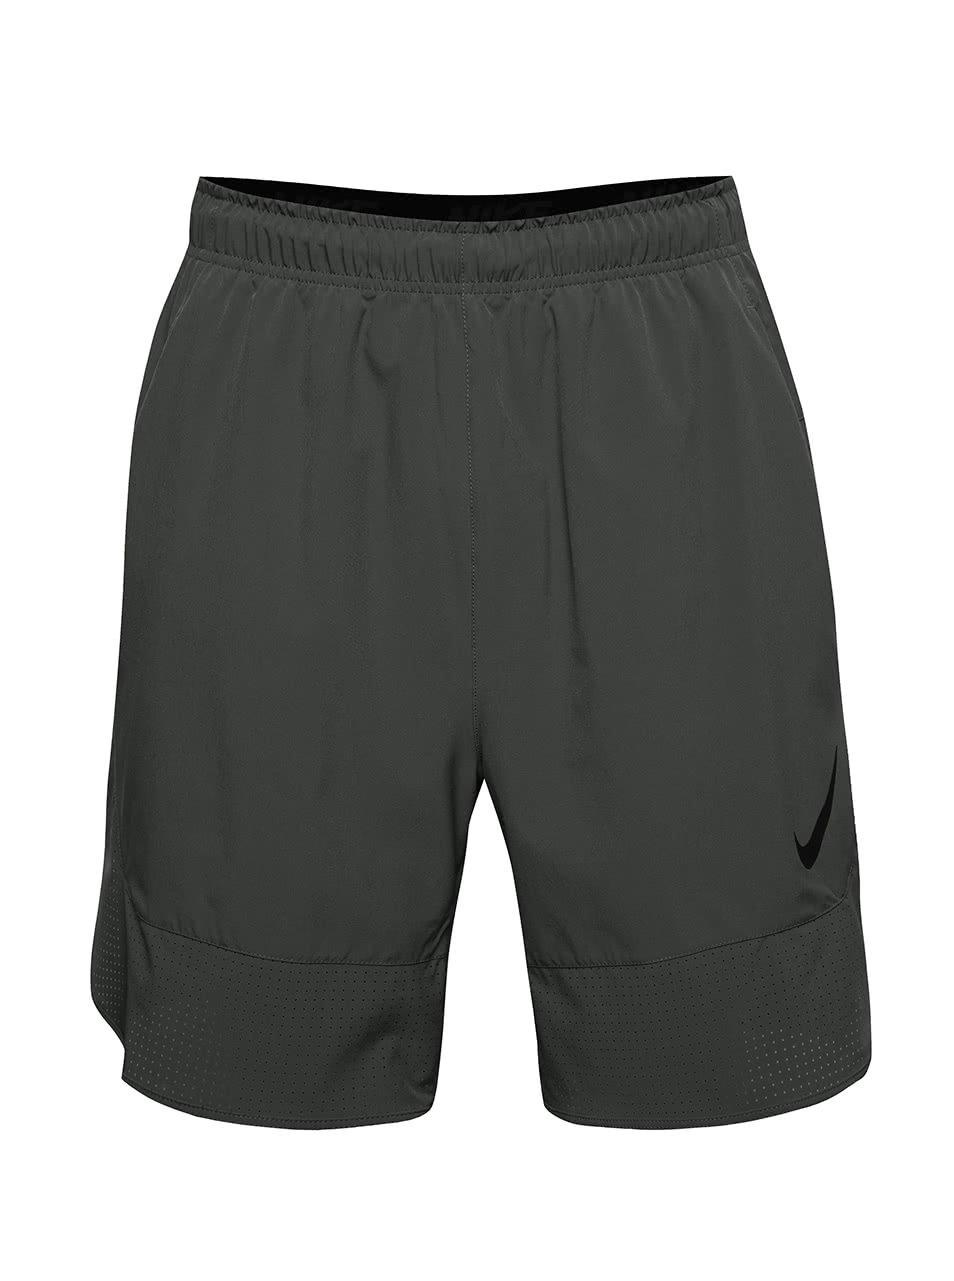 5a26e916d74 Tmavě šedé pánské sportovní kraťasy Nike Flex ...